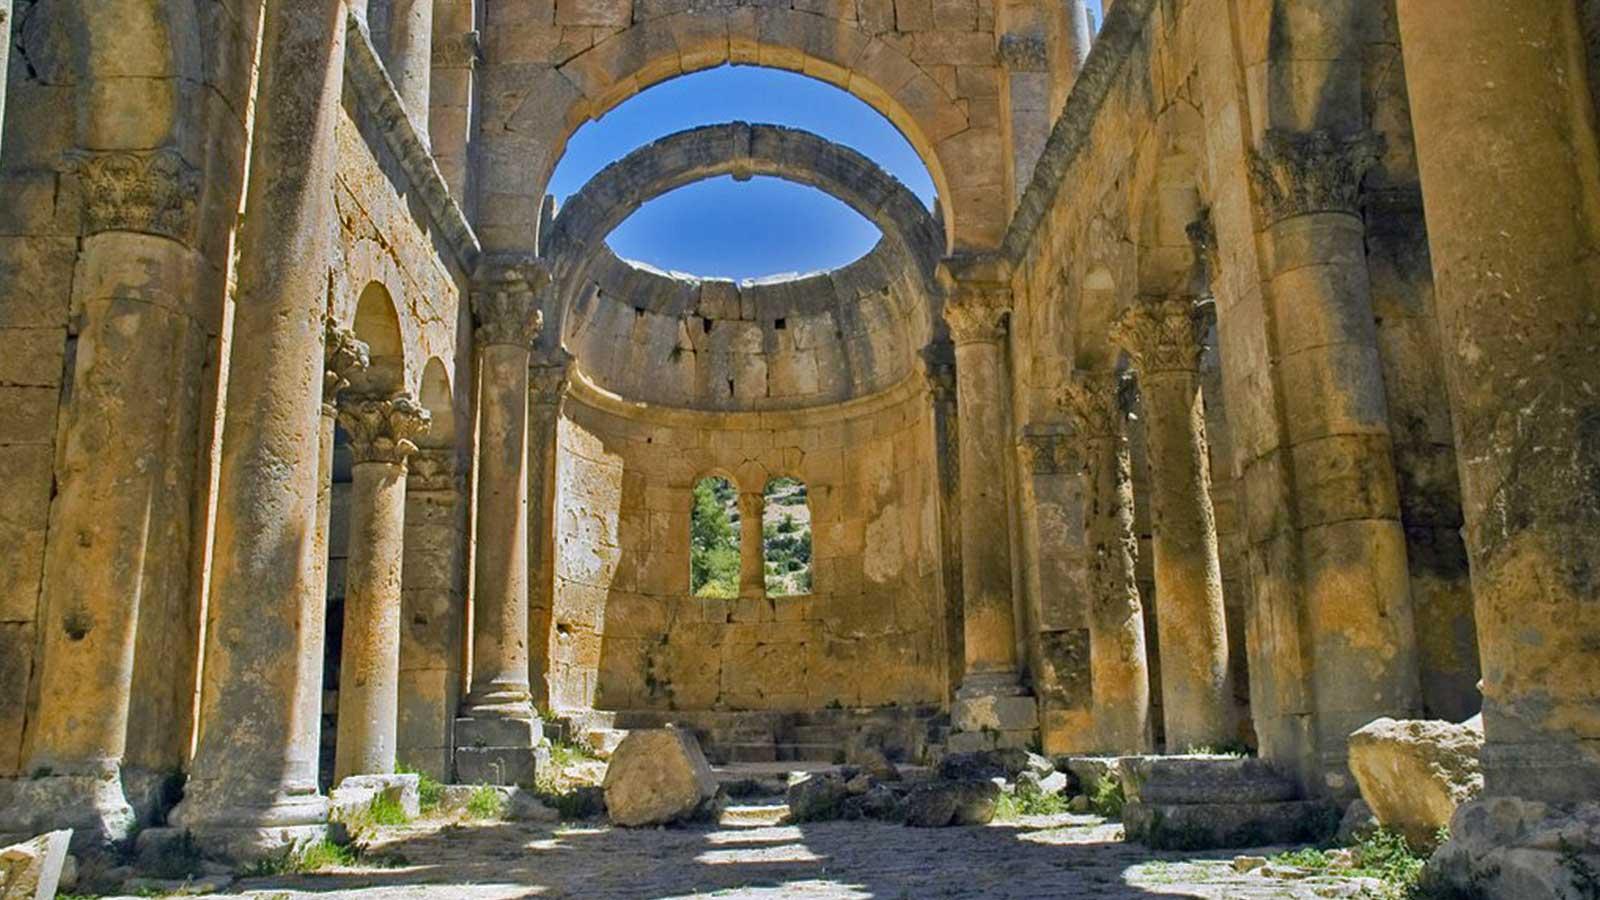 The Alacahan (Alahan) Monastery